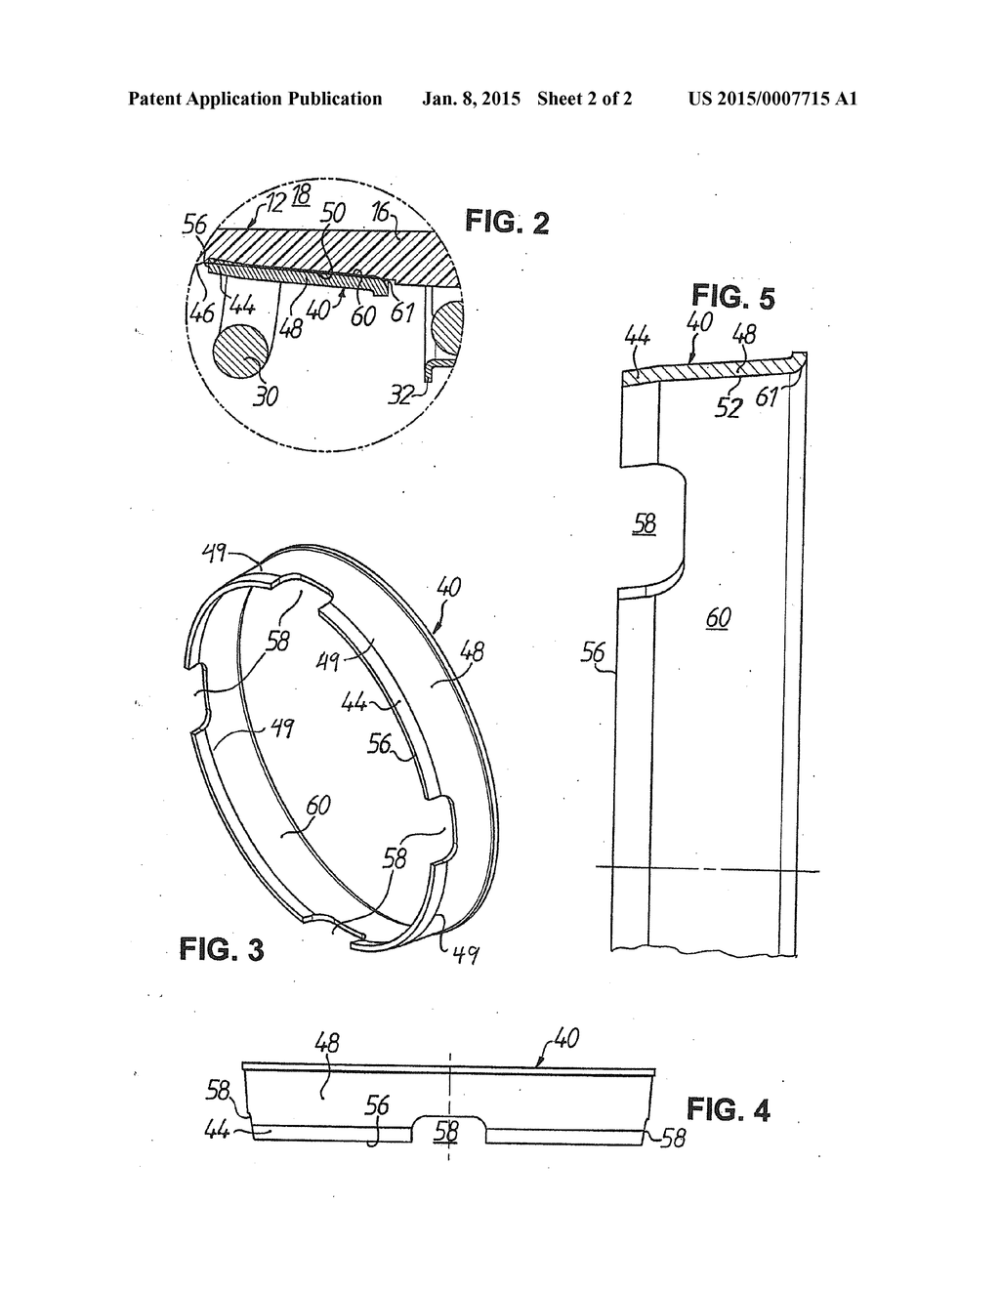 medium resolution of concentric slave cylinder for a hydraulic clutch actuator diagram rh patentsencyclopedia com cj5 clutch bellcrank bracket clutch actuator bushing